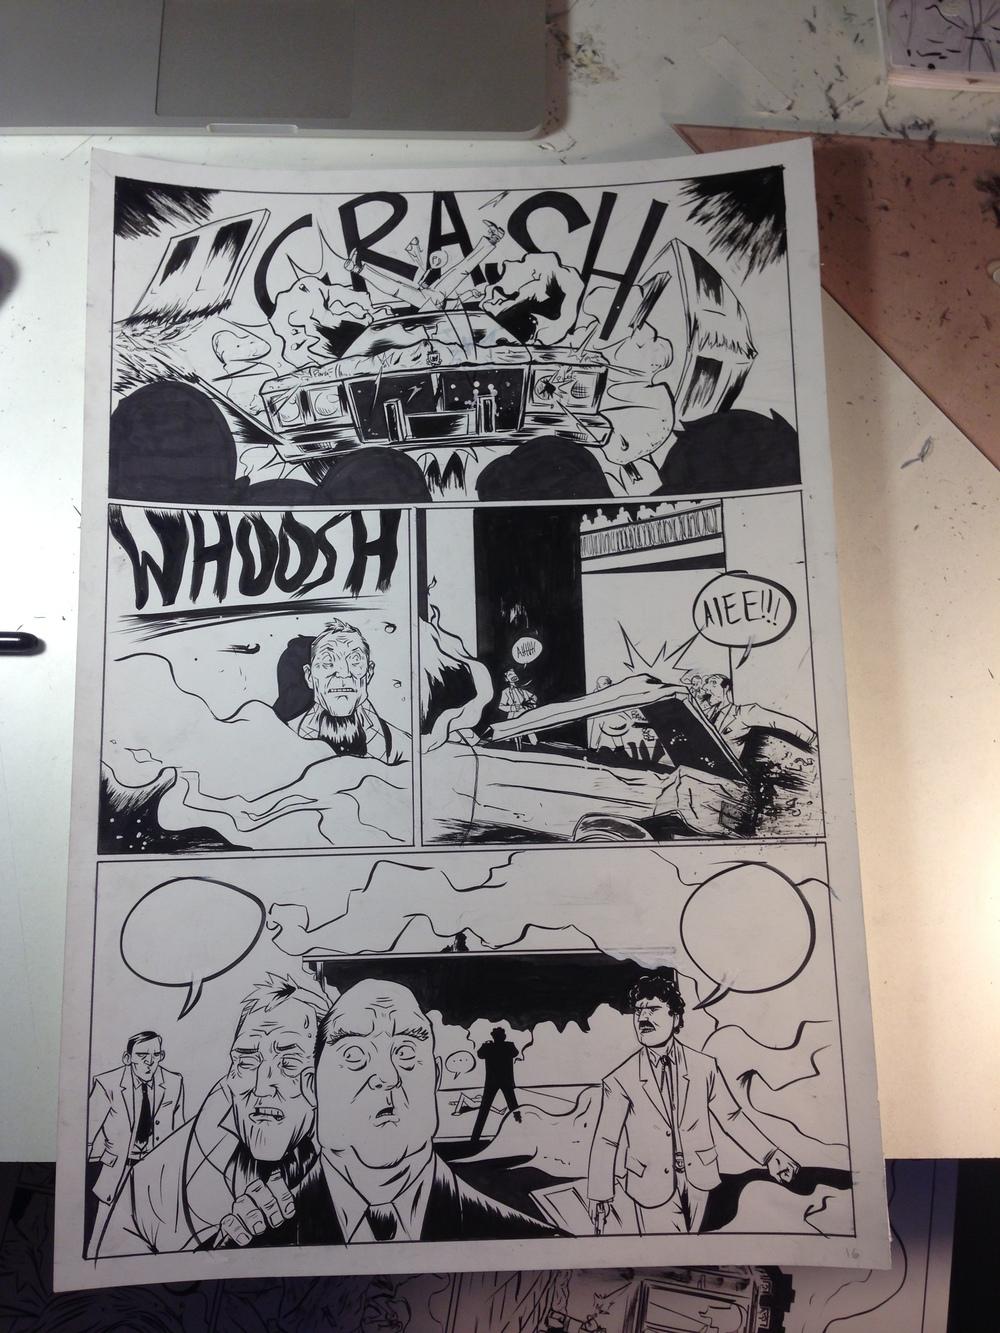 CRASH! 15x22 Bristol Board $200/OBO